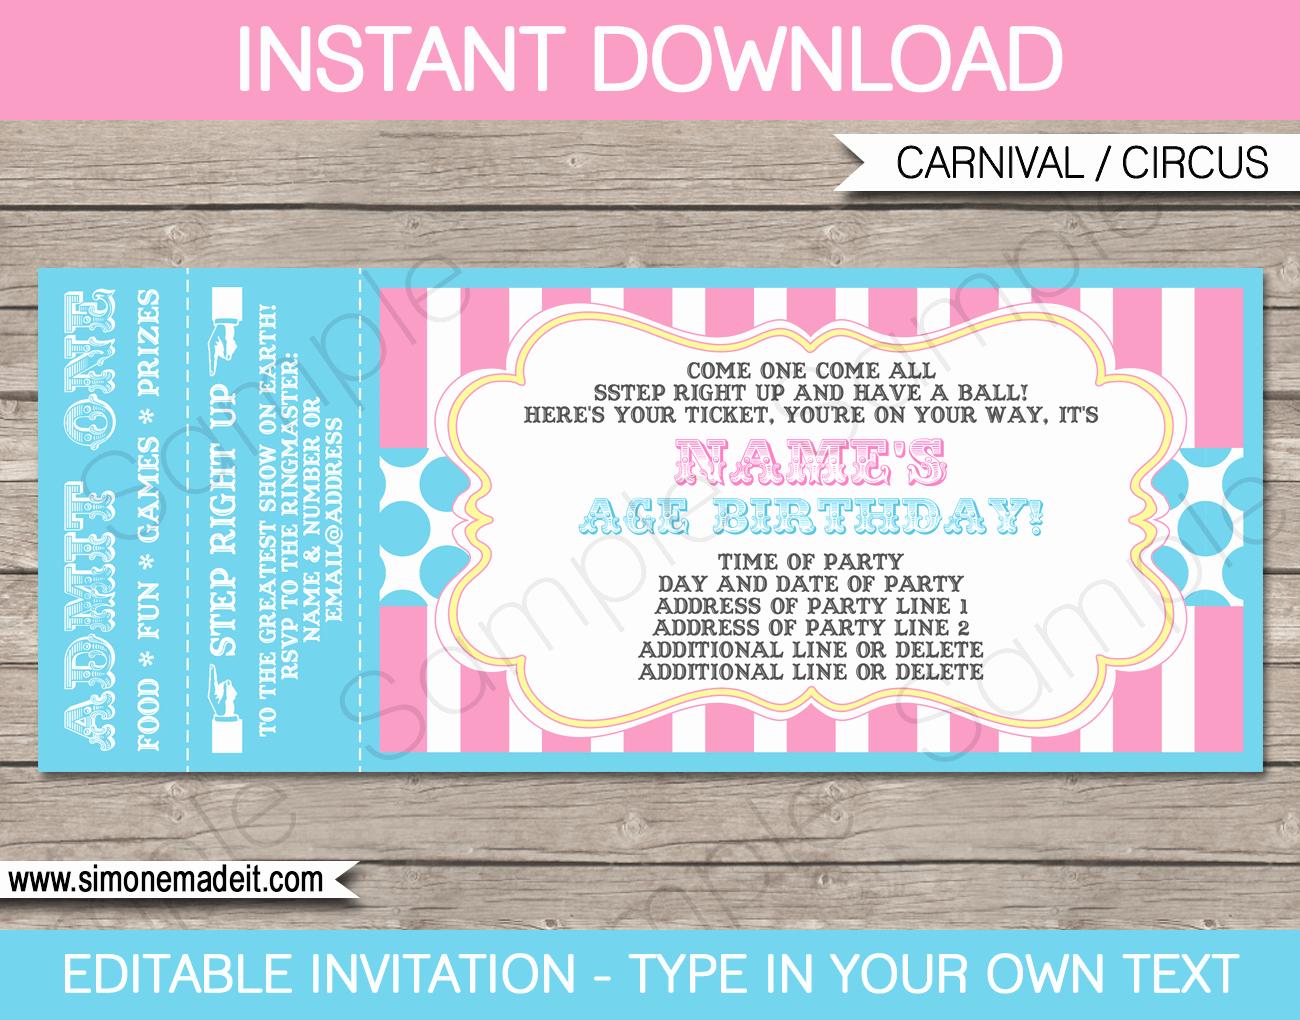 Admission Ticket Invitation Template Free Fresh Carnival Party Ticket Invitations Template